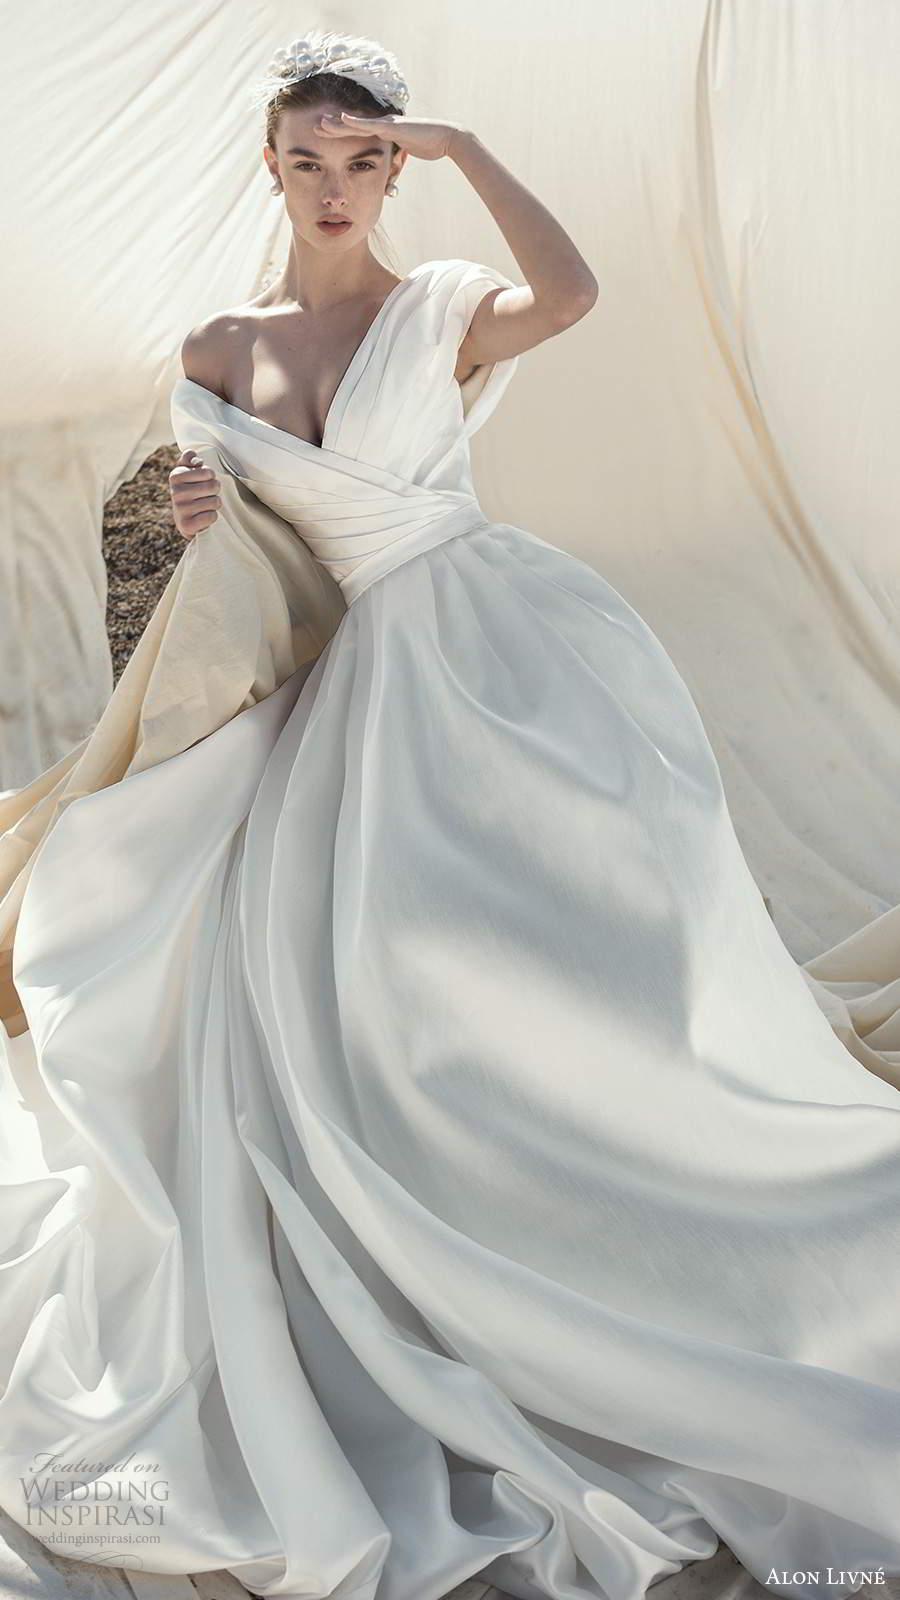 alon livne fall 2020 bridal short puff sleeves off shoulder v neckline pleated bodice a line ball gown wedding dress (1) mv